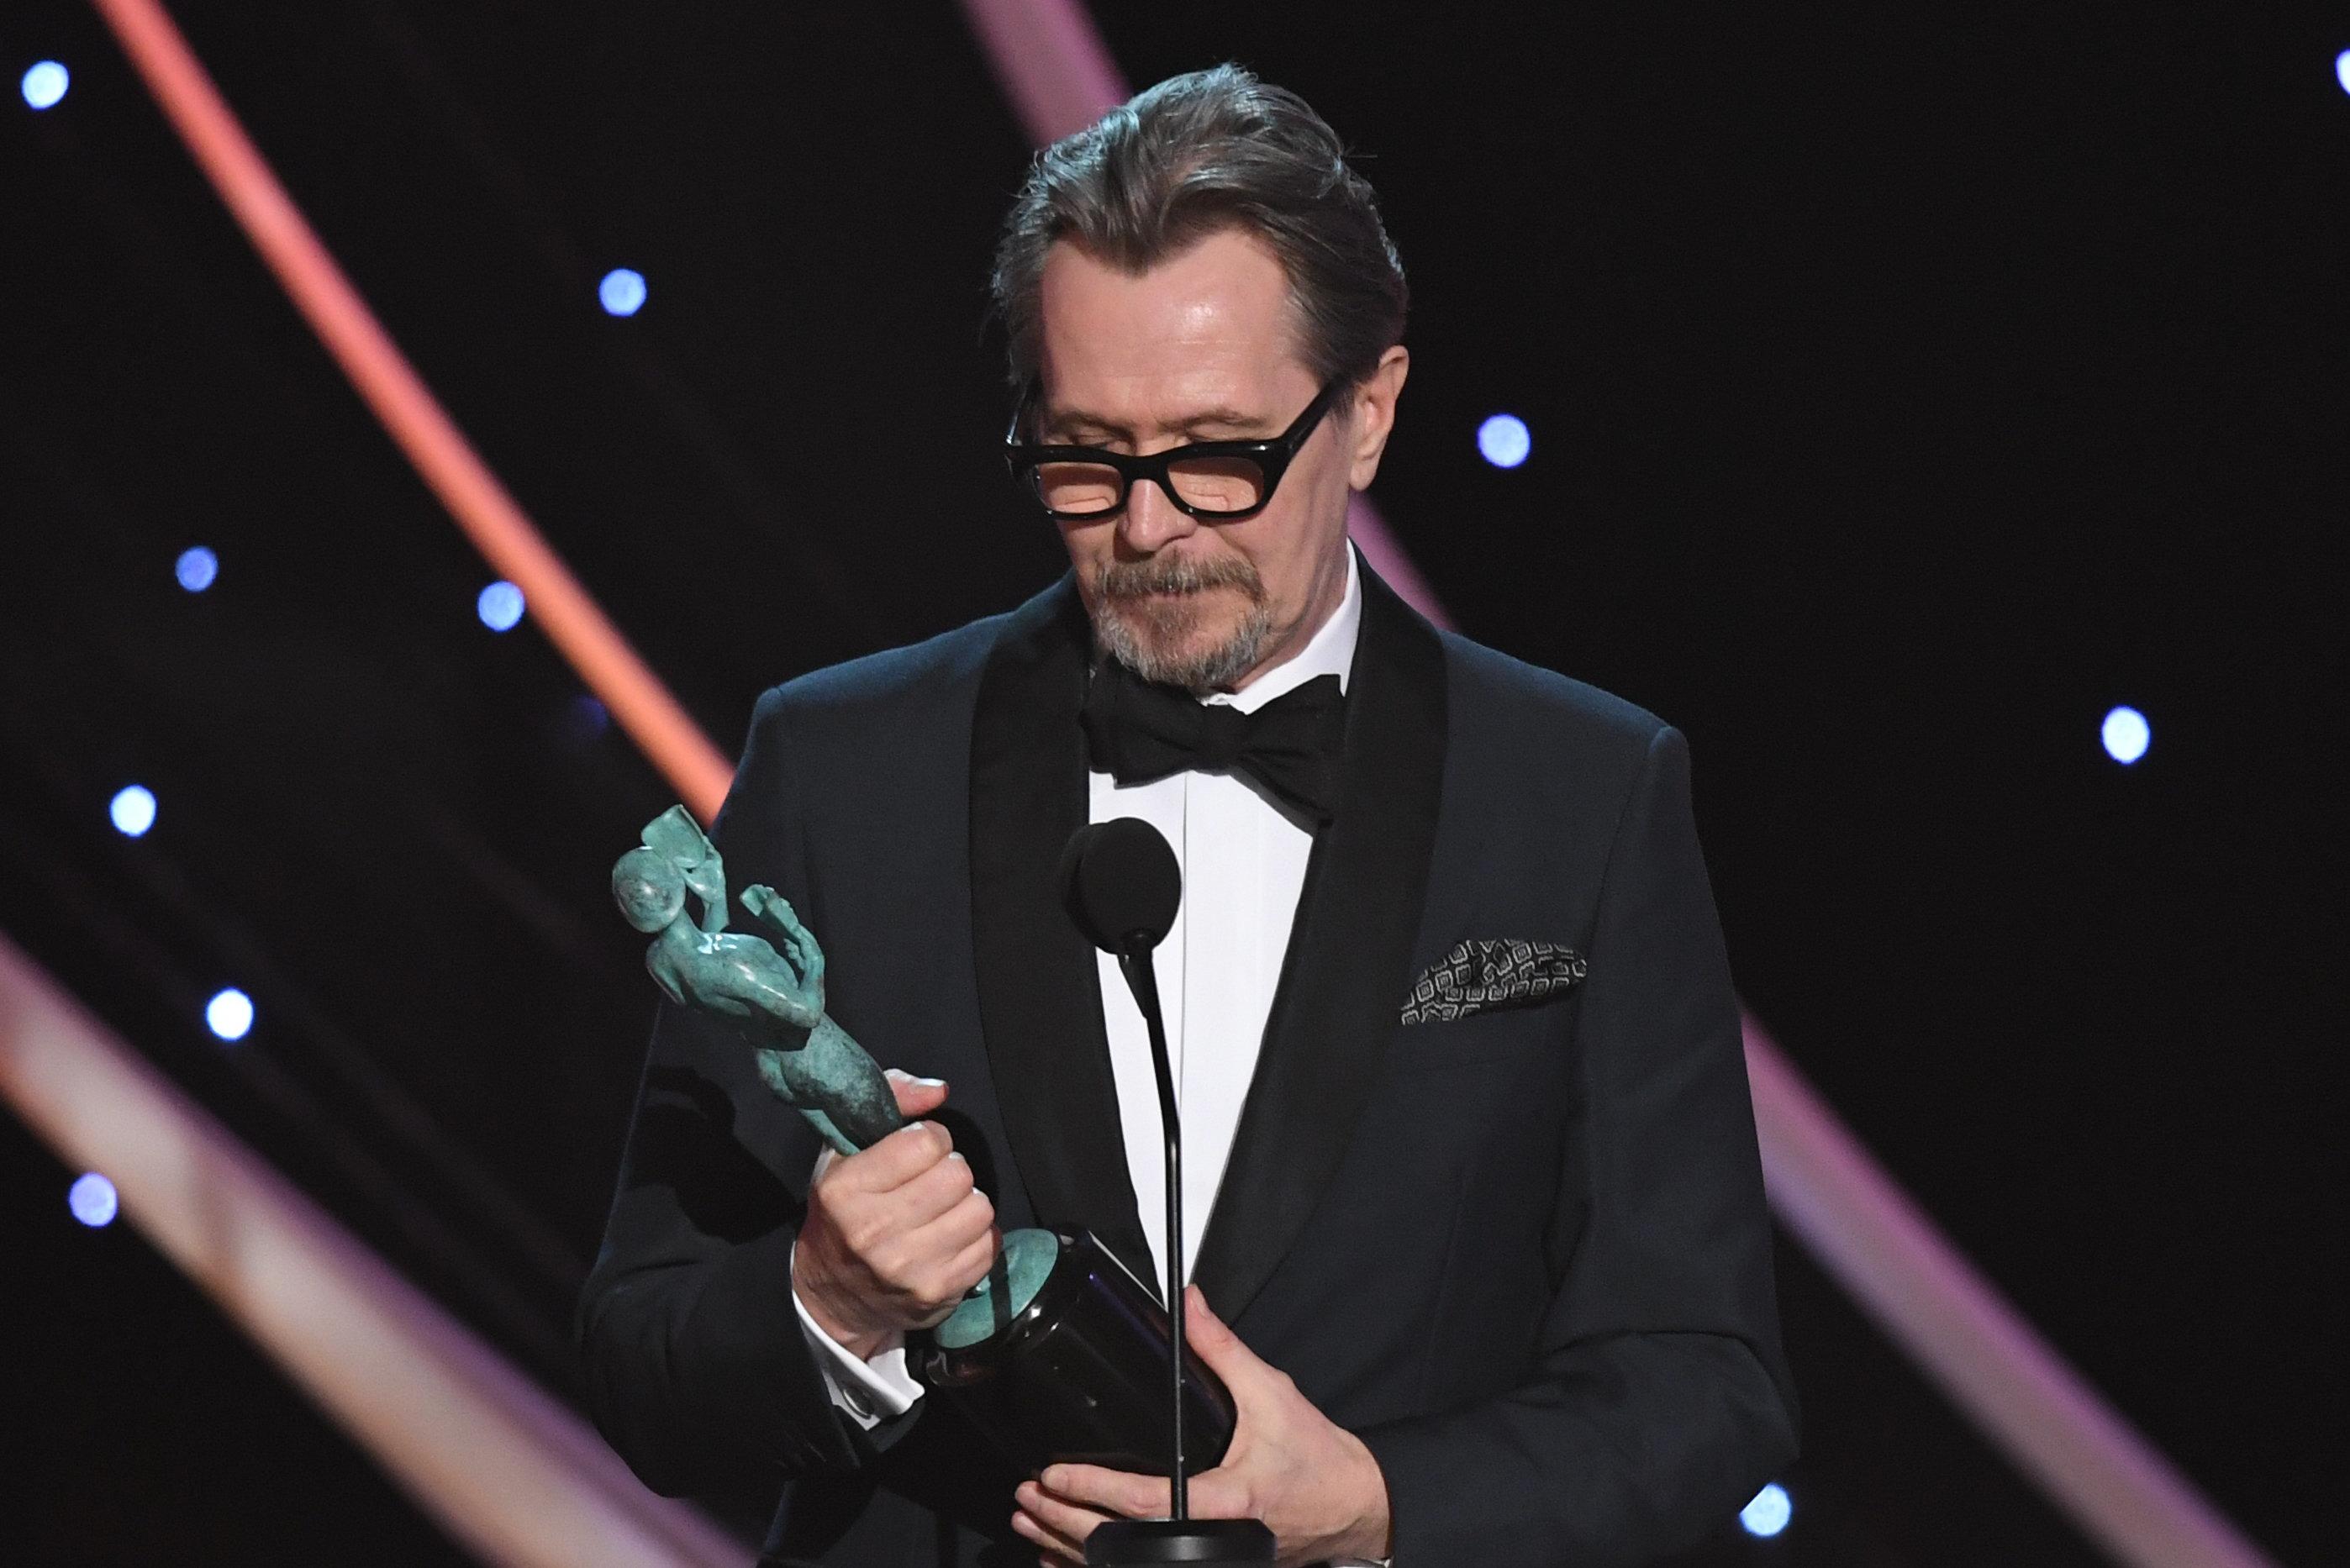 Gary Oldman won a SAG Award on Sunday